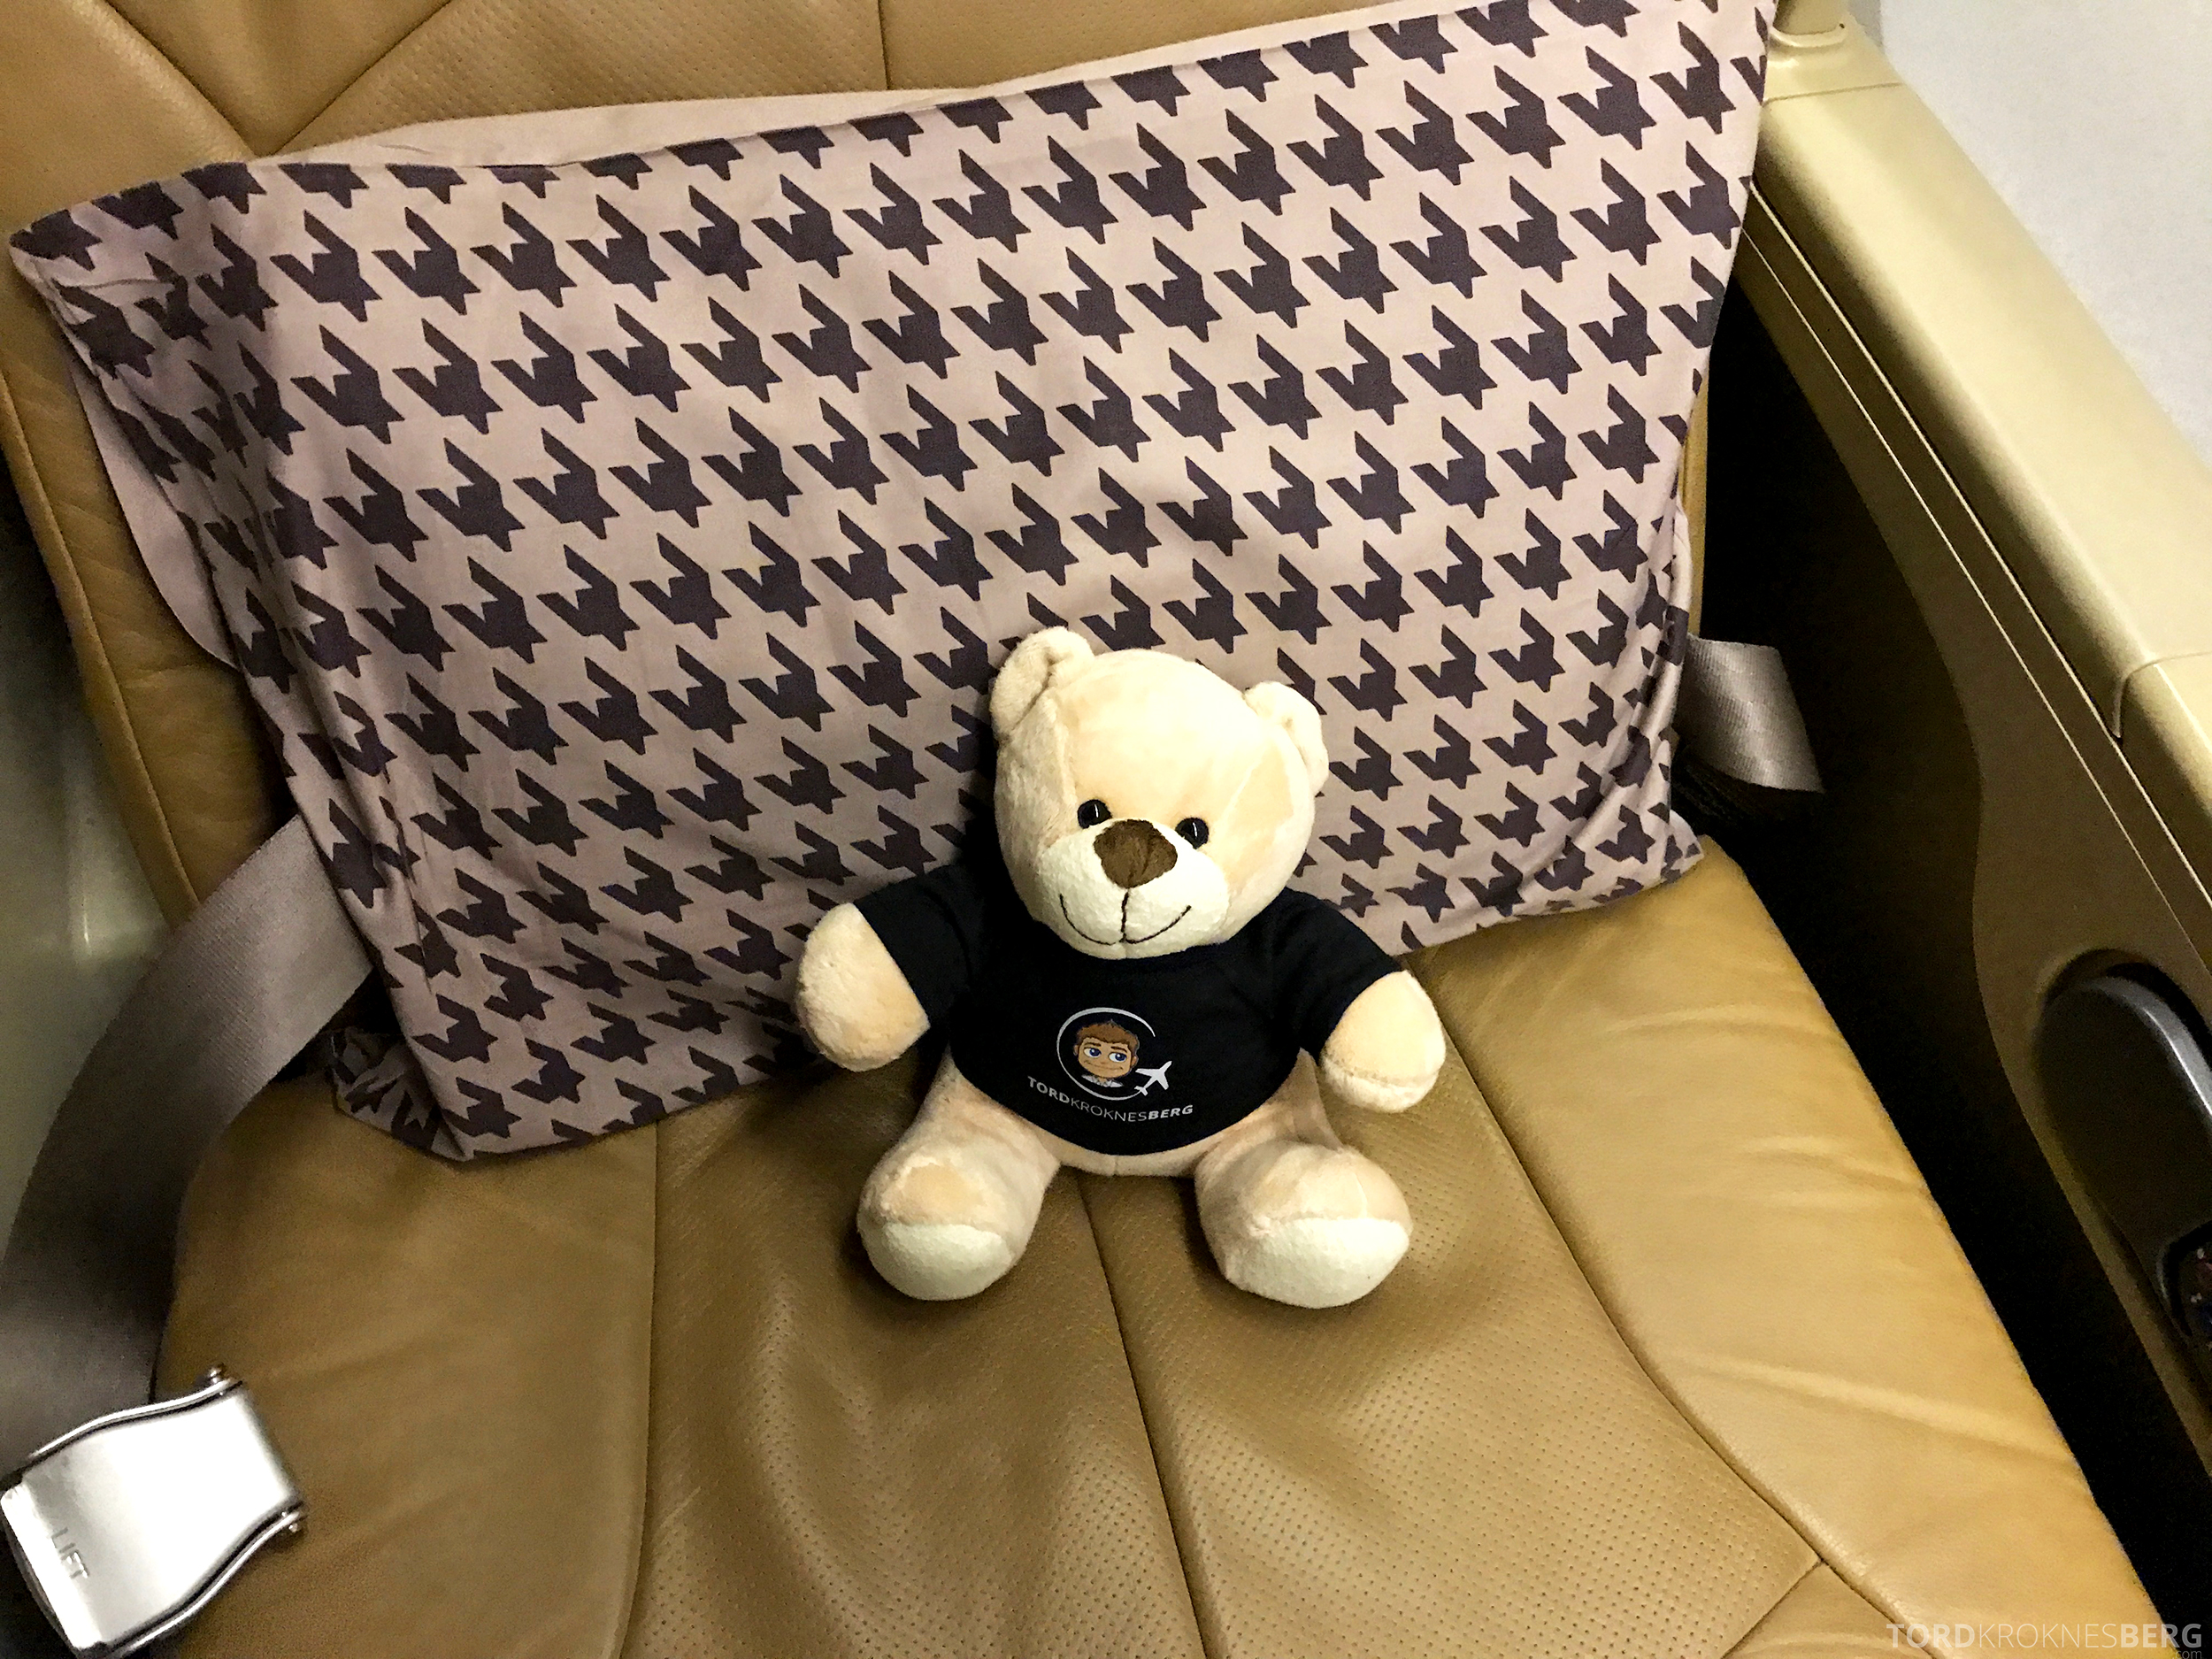 Singapore Airlines Business Class Canberra reisefølge i sete